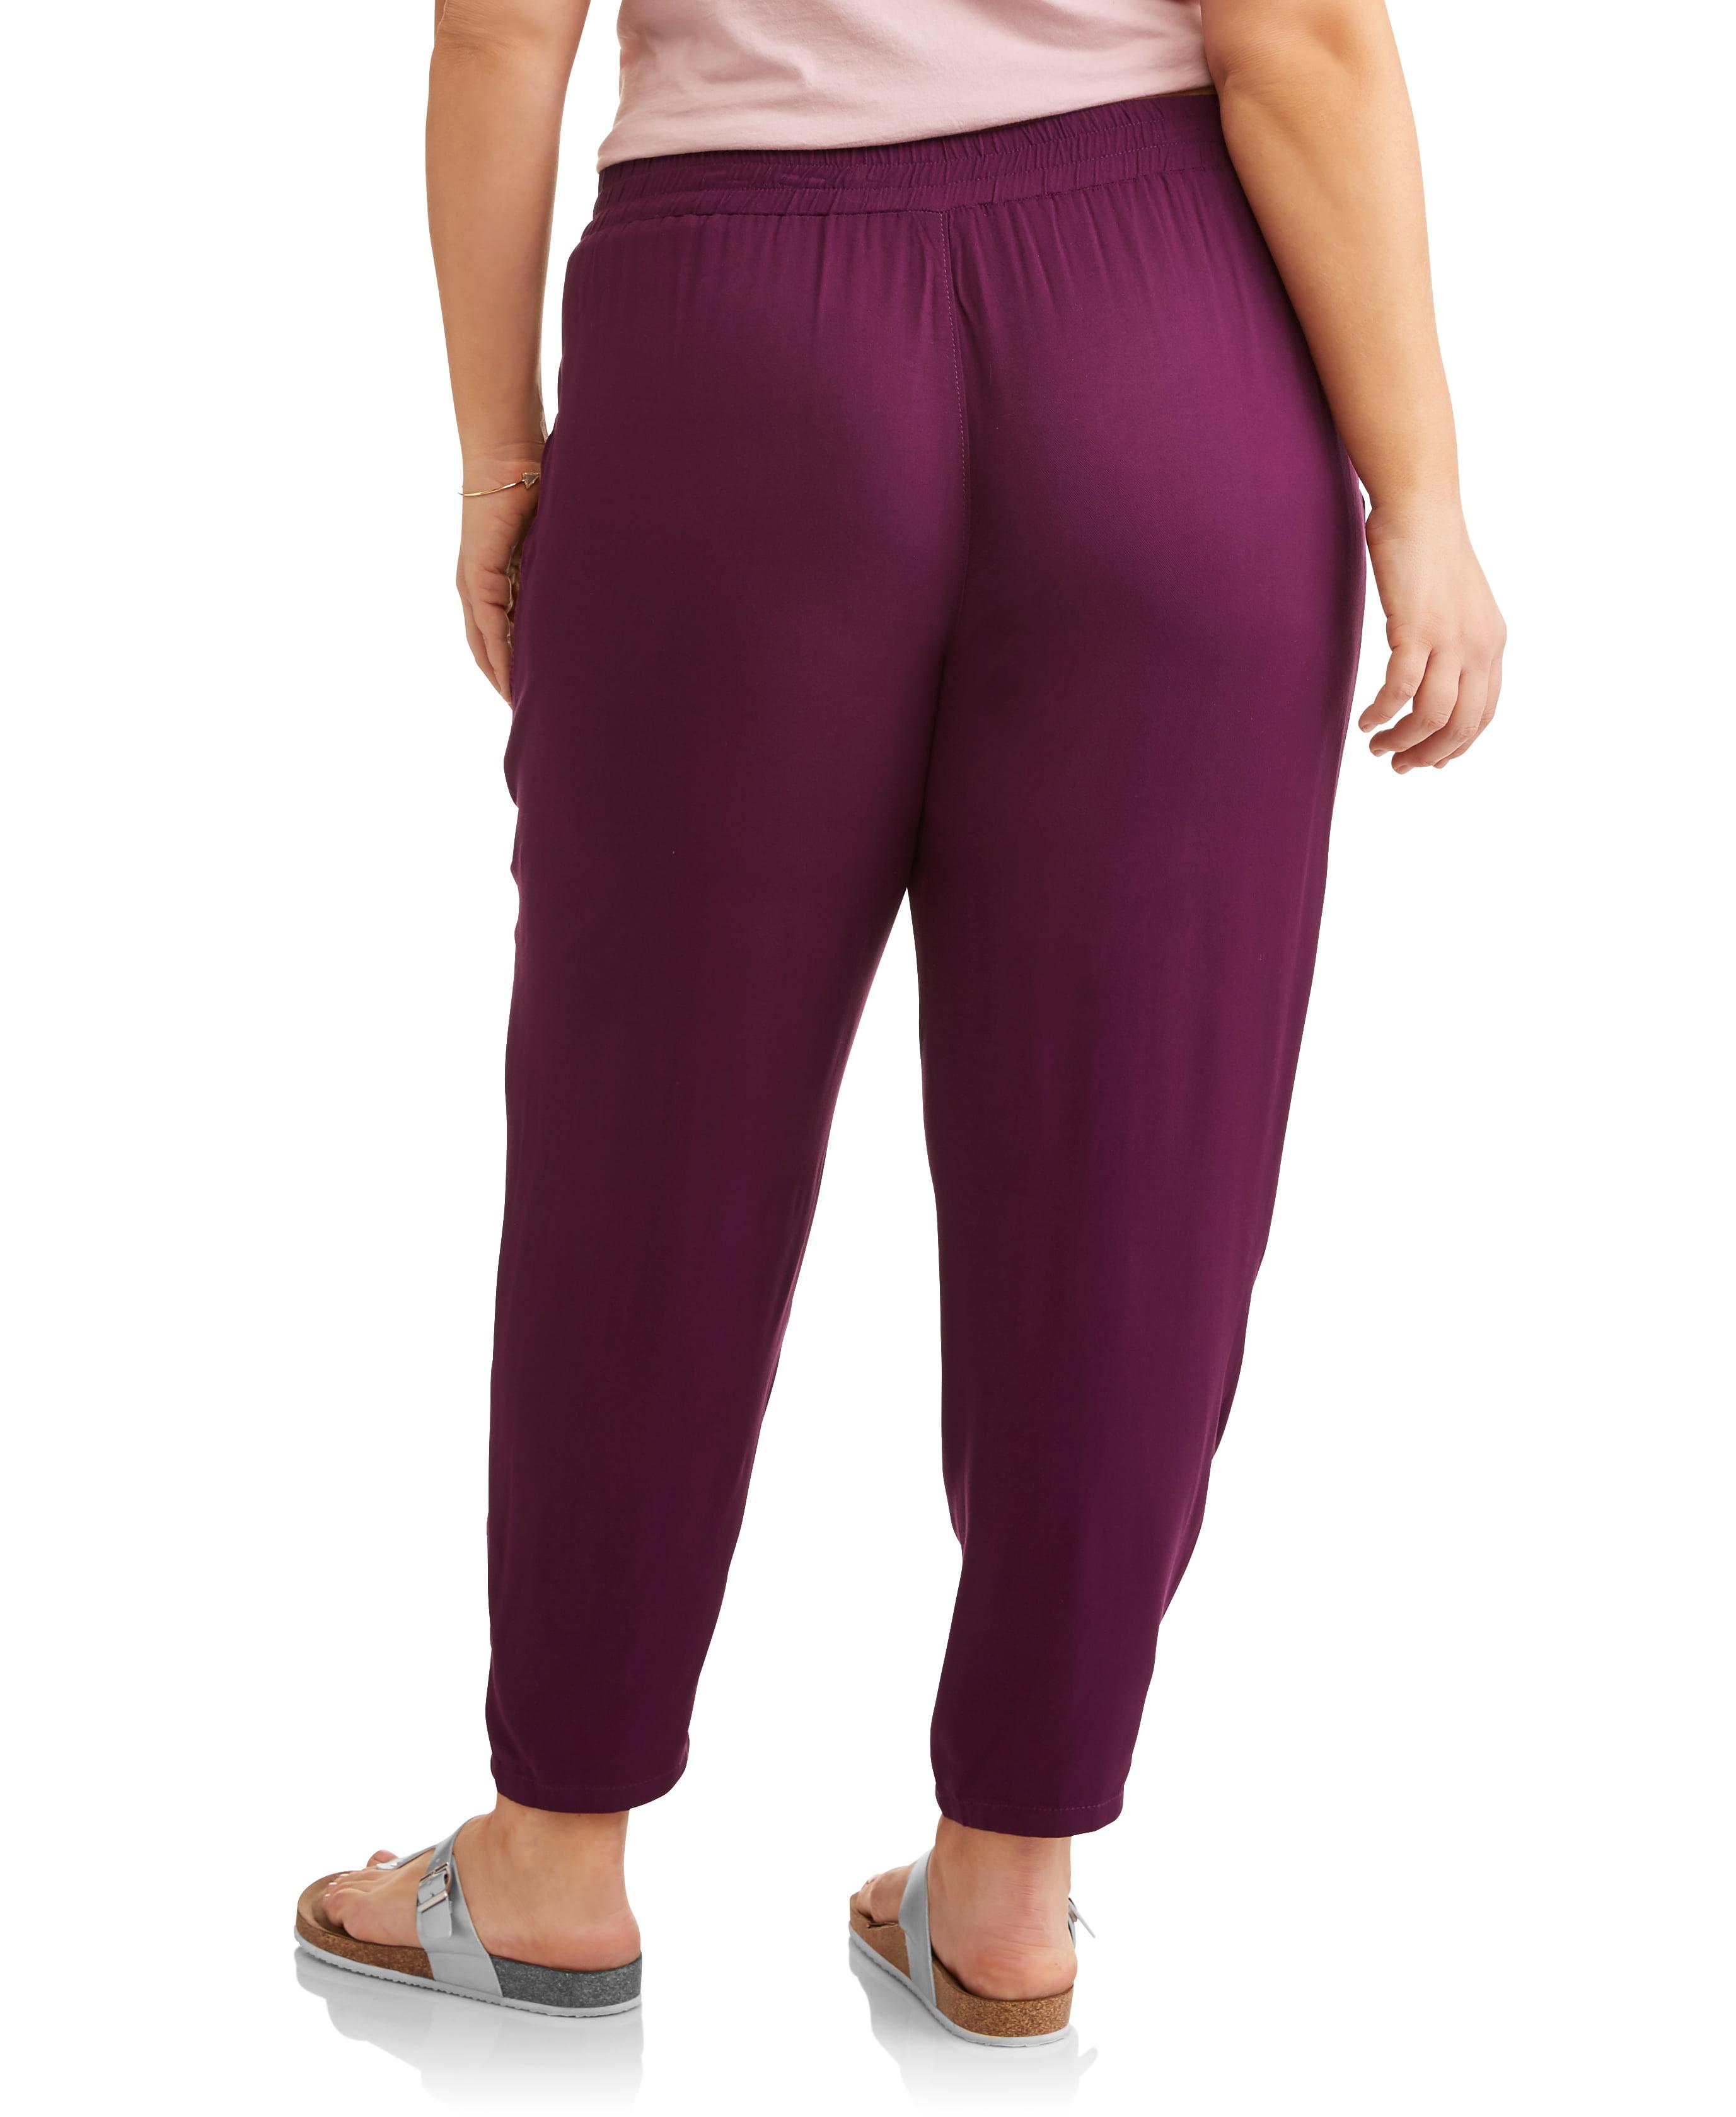 9ed3e407501f6 Terra   Sky - Women s Plus Drawstring 2 Pocket Soft Pants - Walmart.com